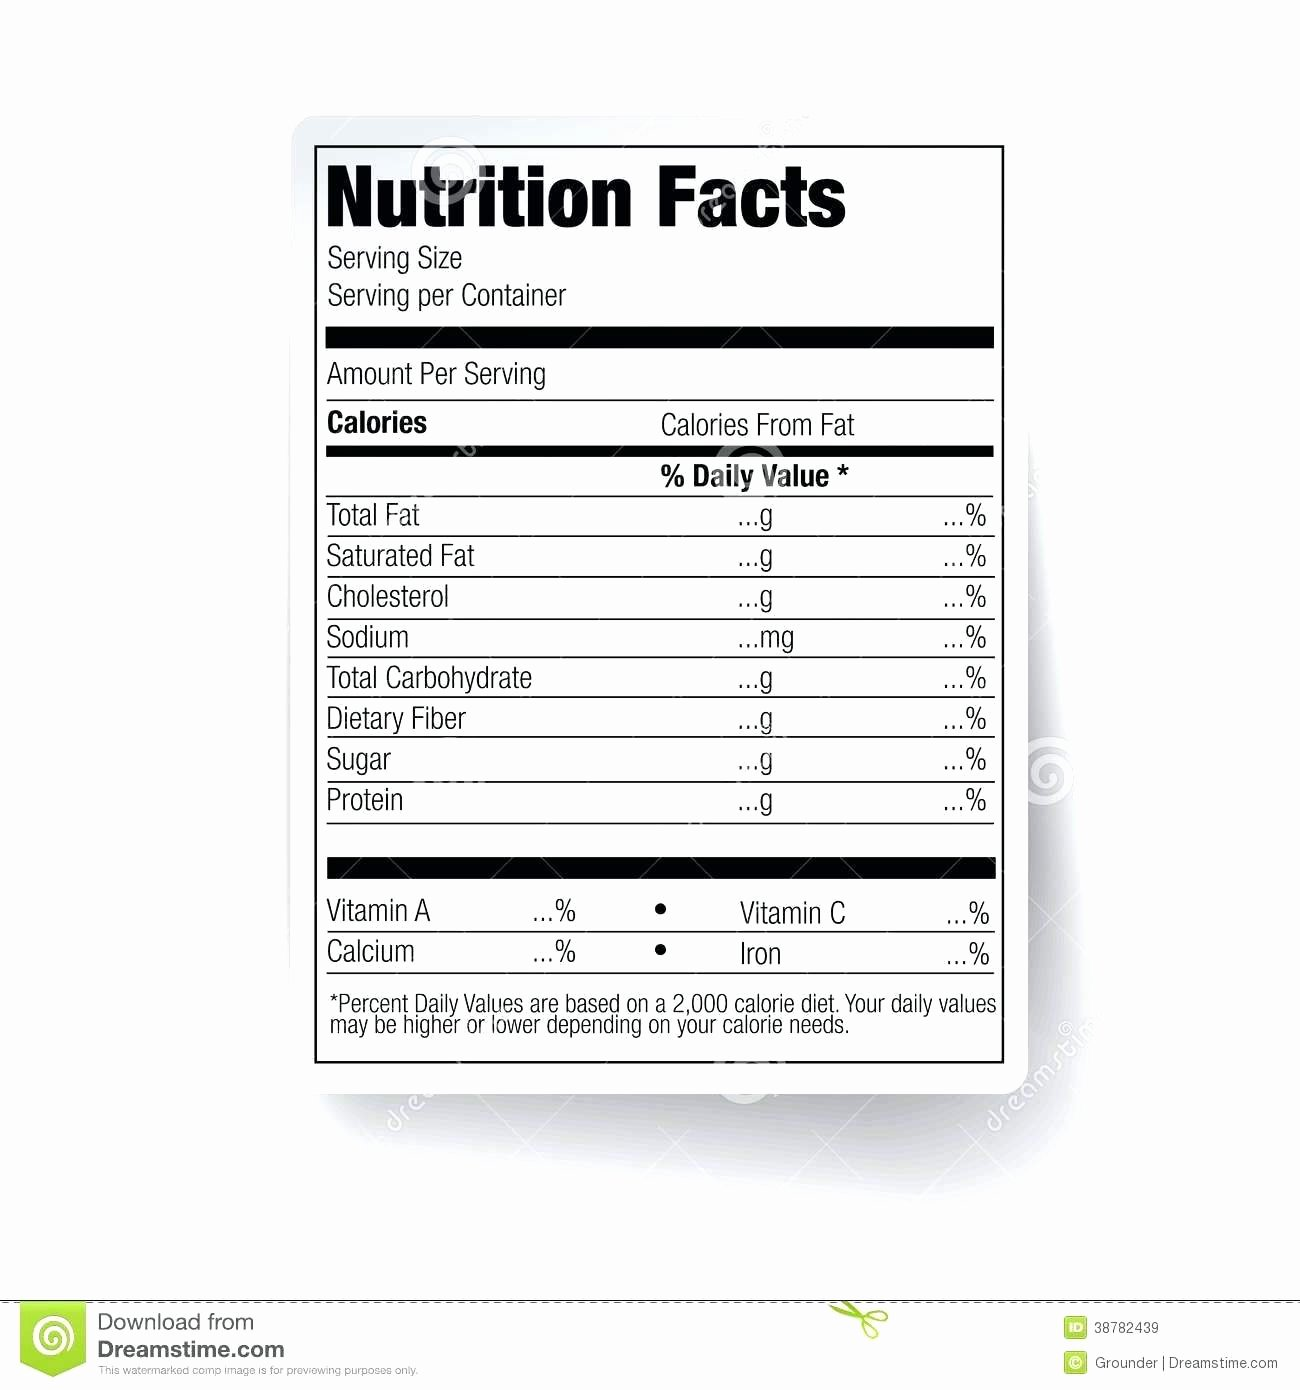 Nutrition Fact Label Maker Nutrition Ftempo Latter